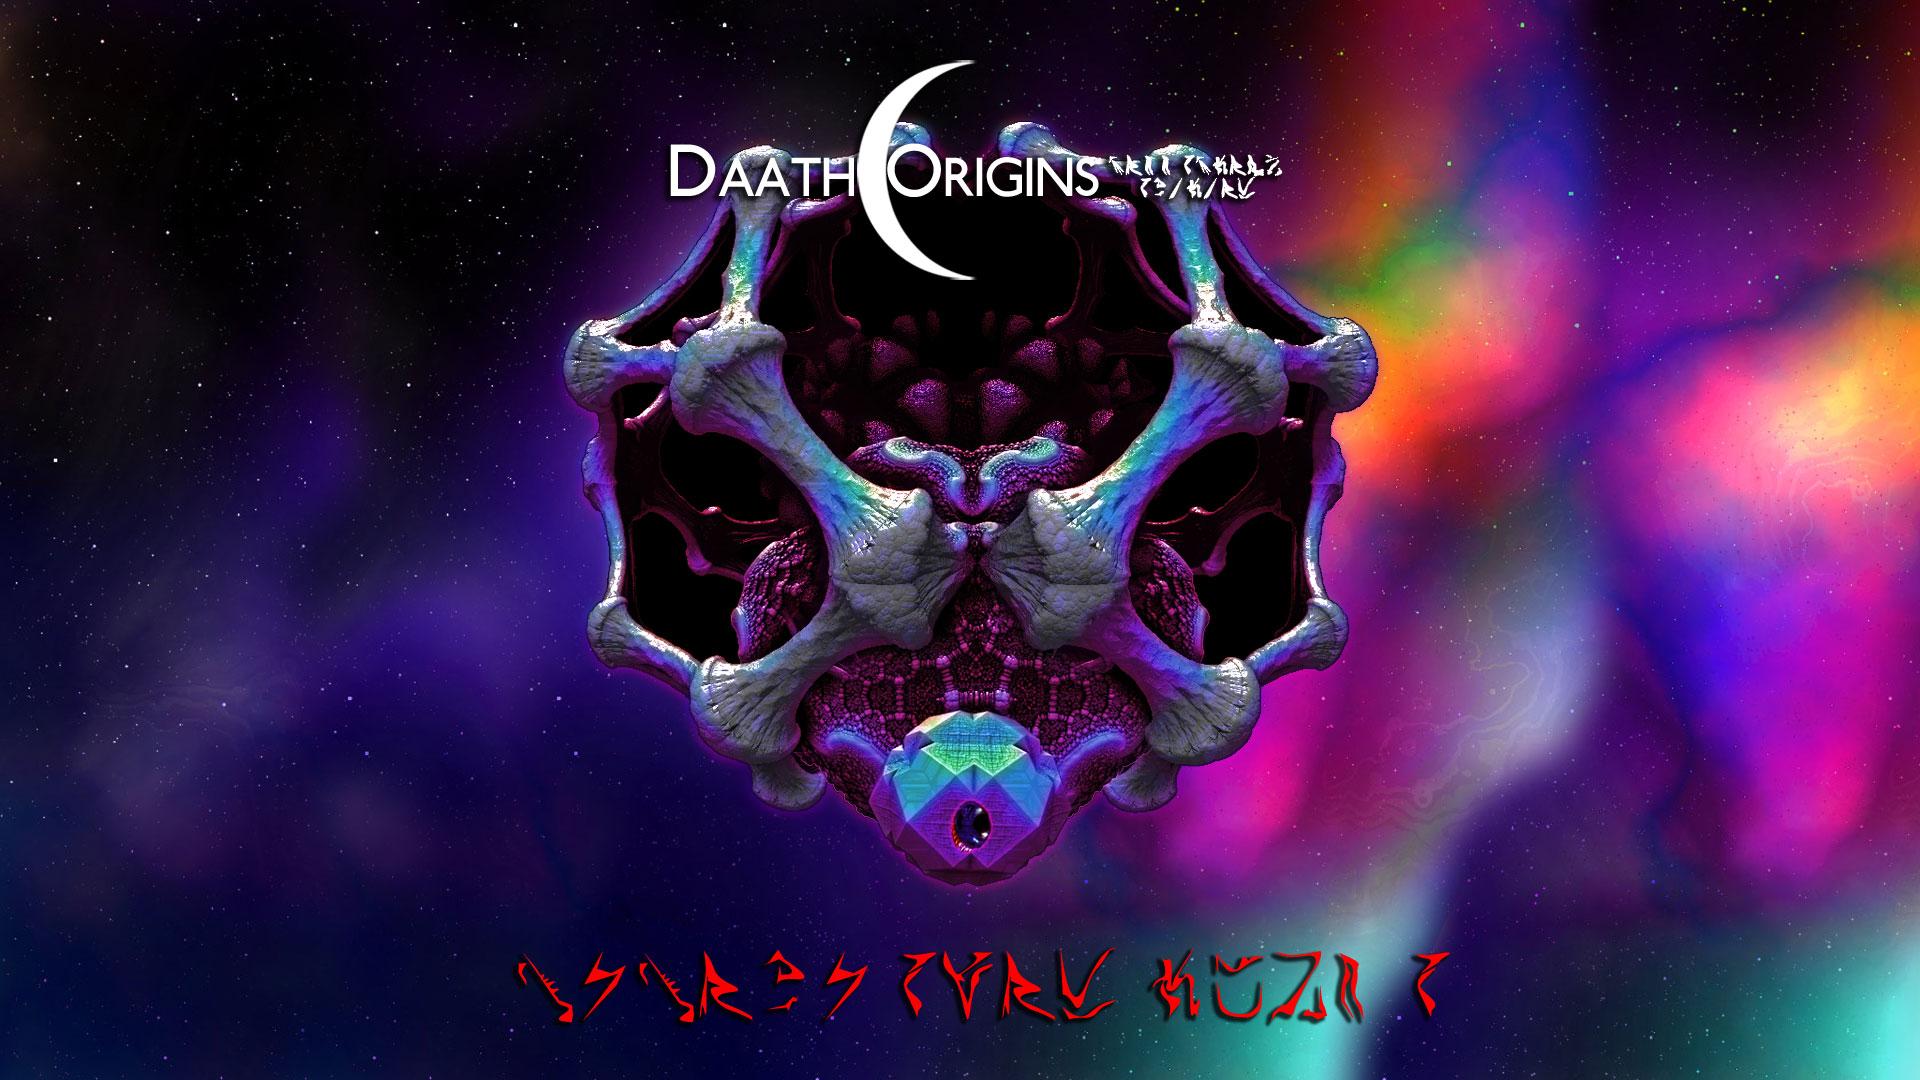 Daath Origins